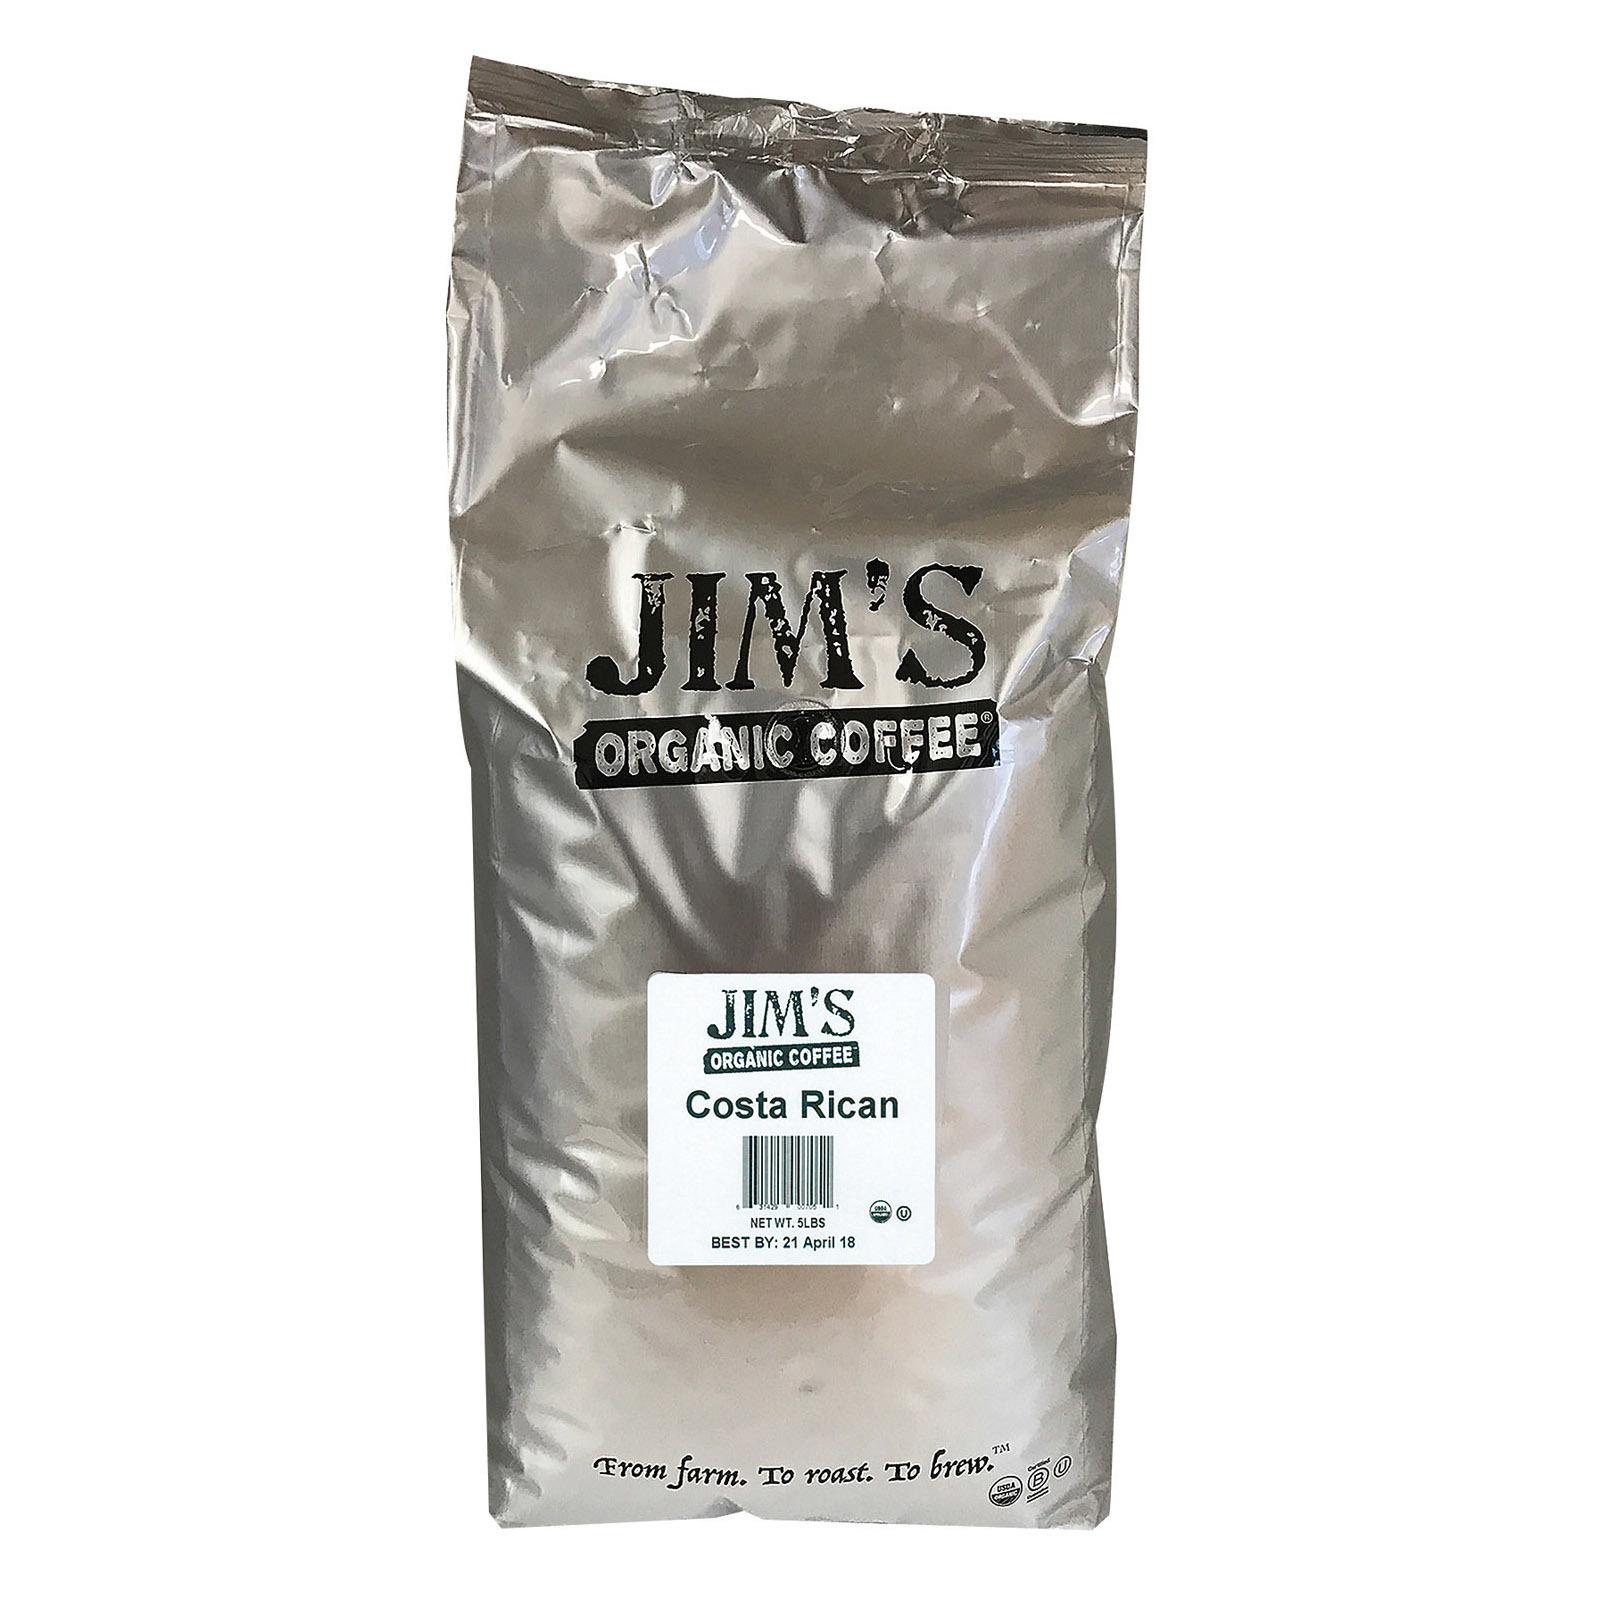 Jim's Organic Coffee - Whole Bean - Costa Rican - Bulk - 5 lb.